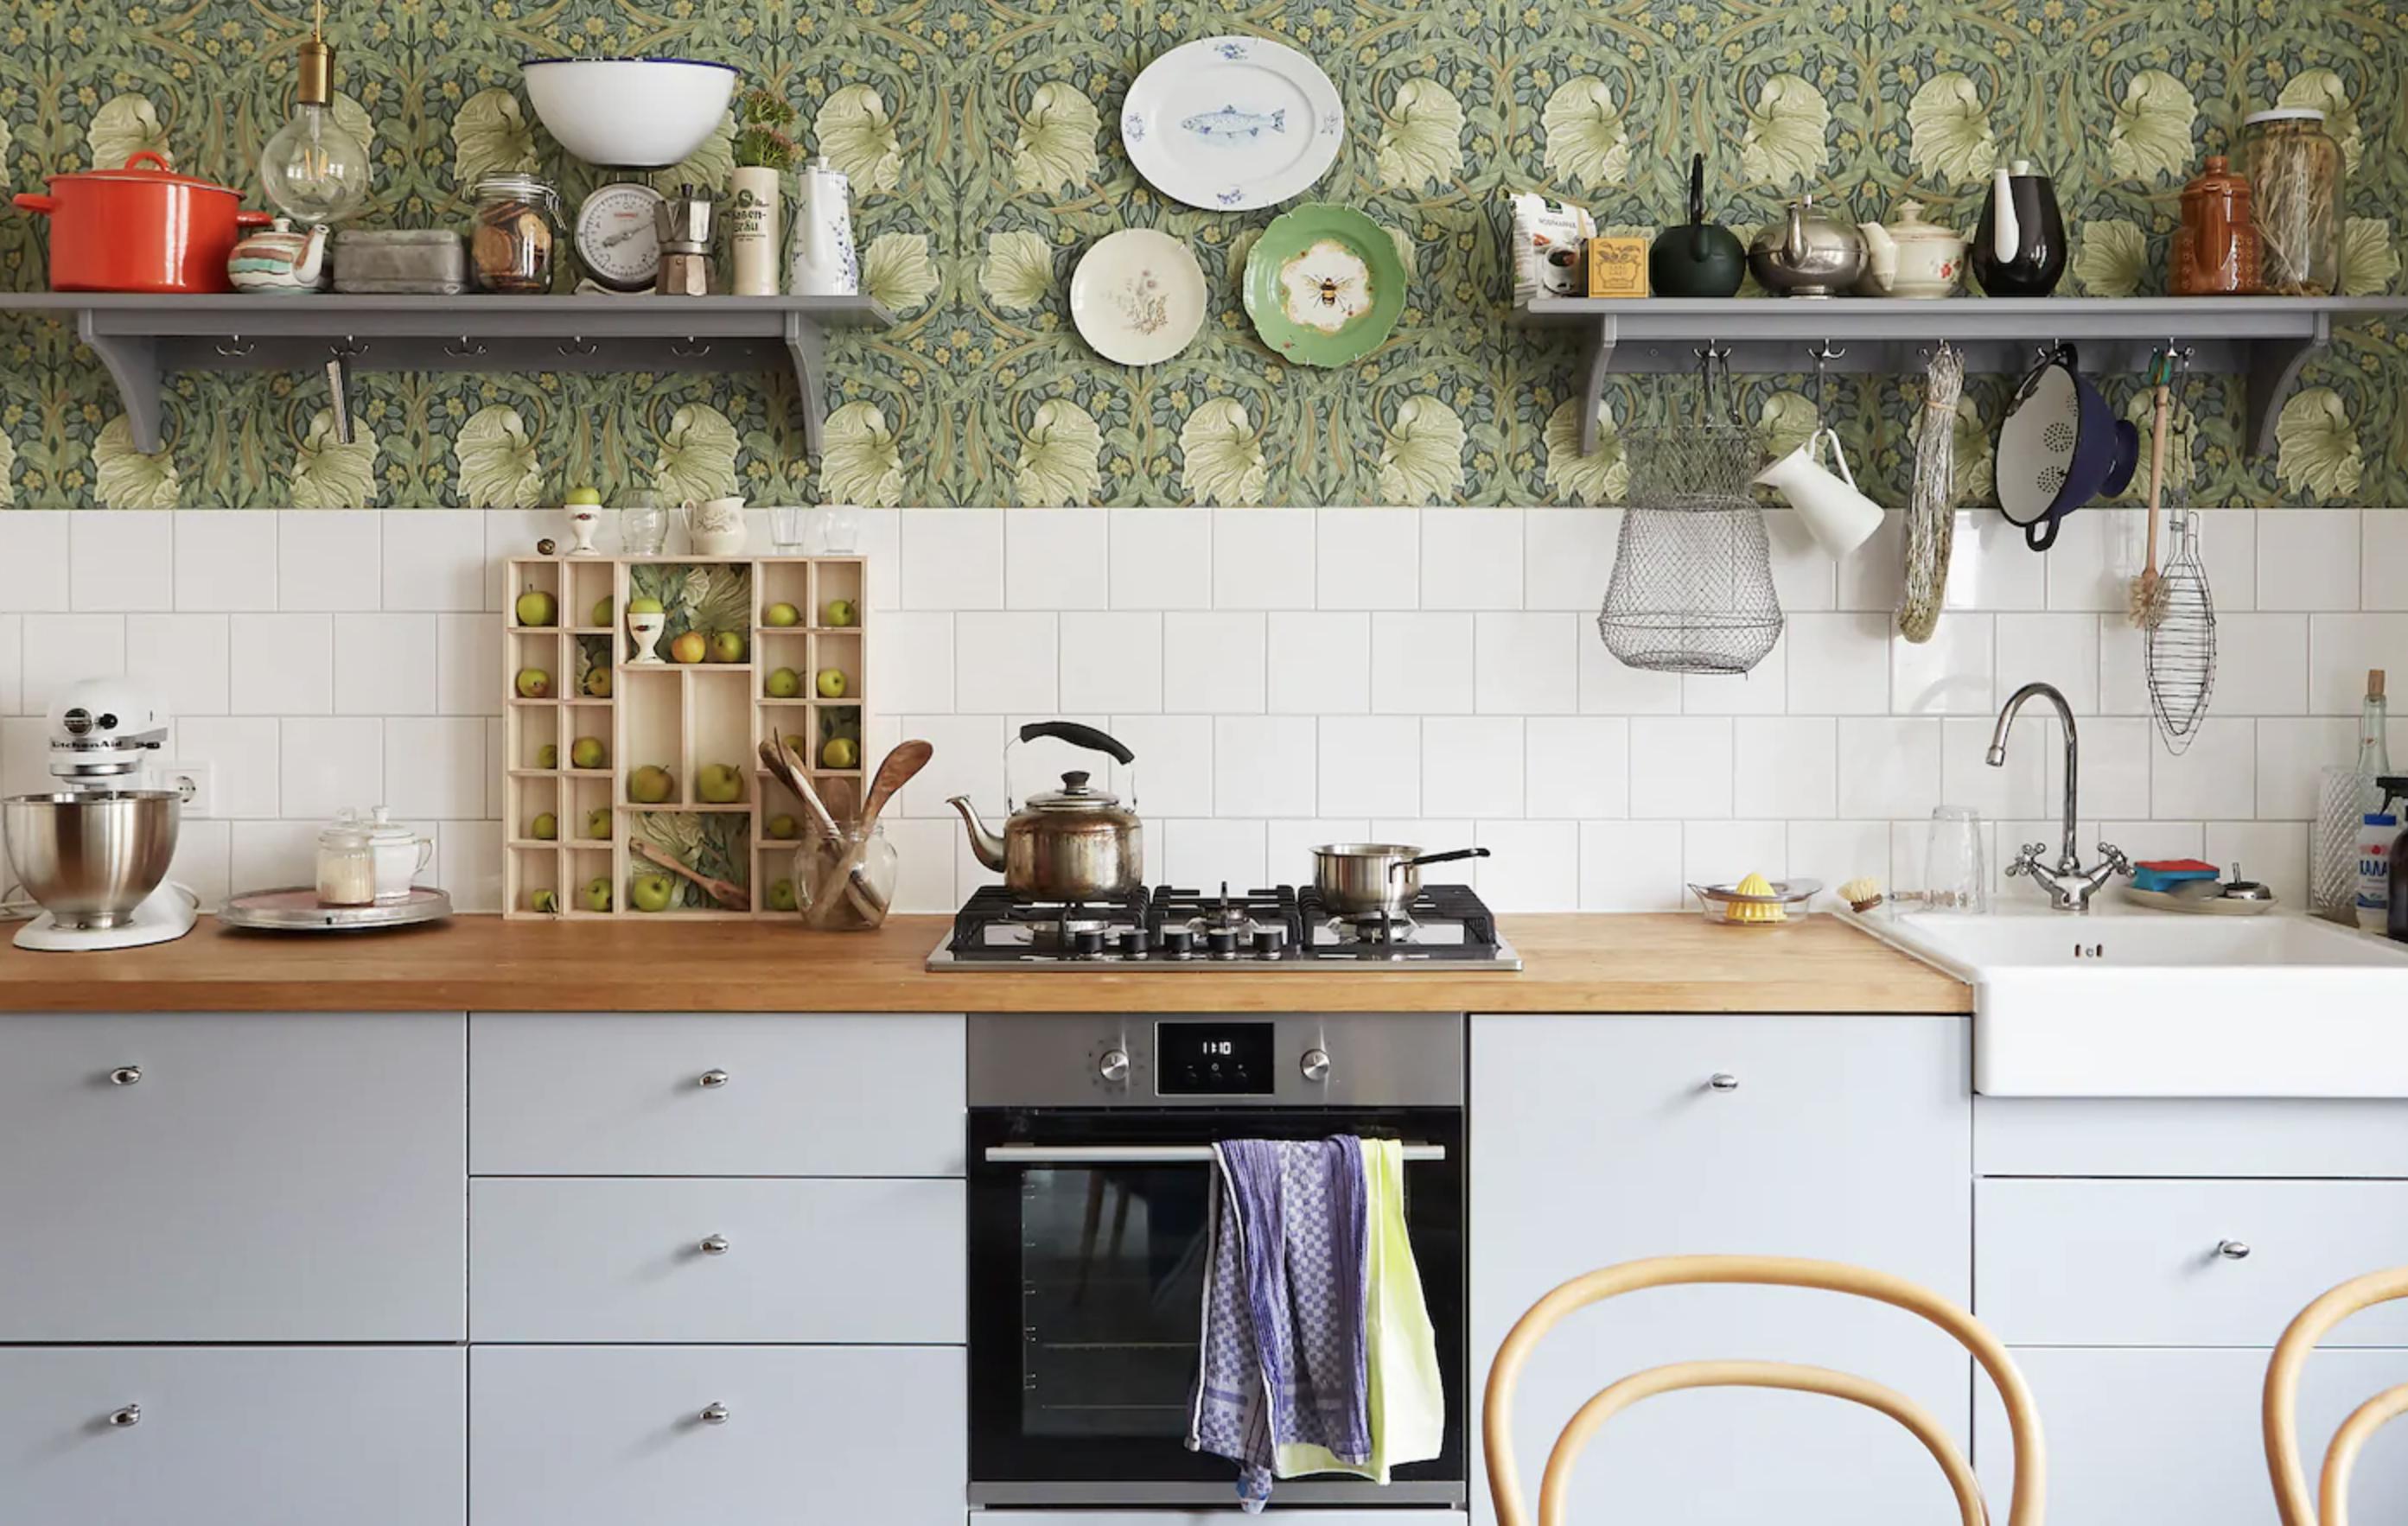 Ikea Kitchen Hacks 5 Ways To Make Standard Stylish Ikea Kitchen Or Not Real Homes